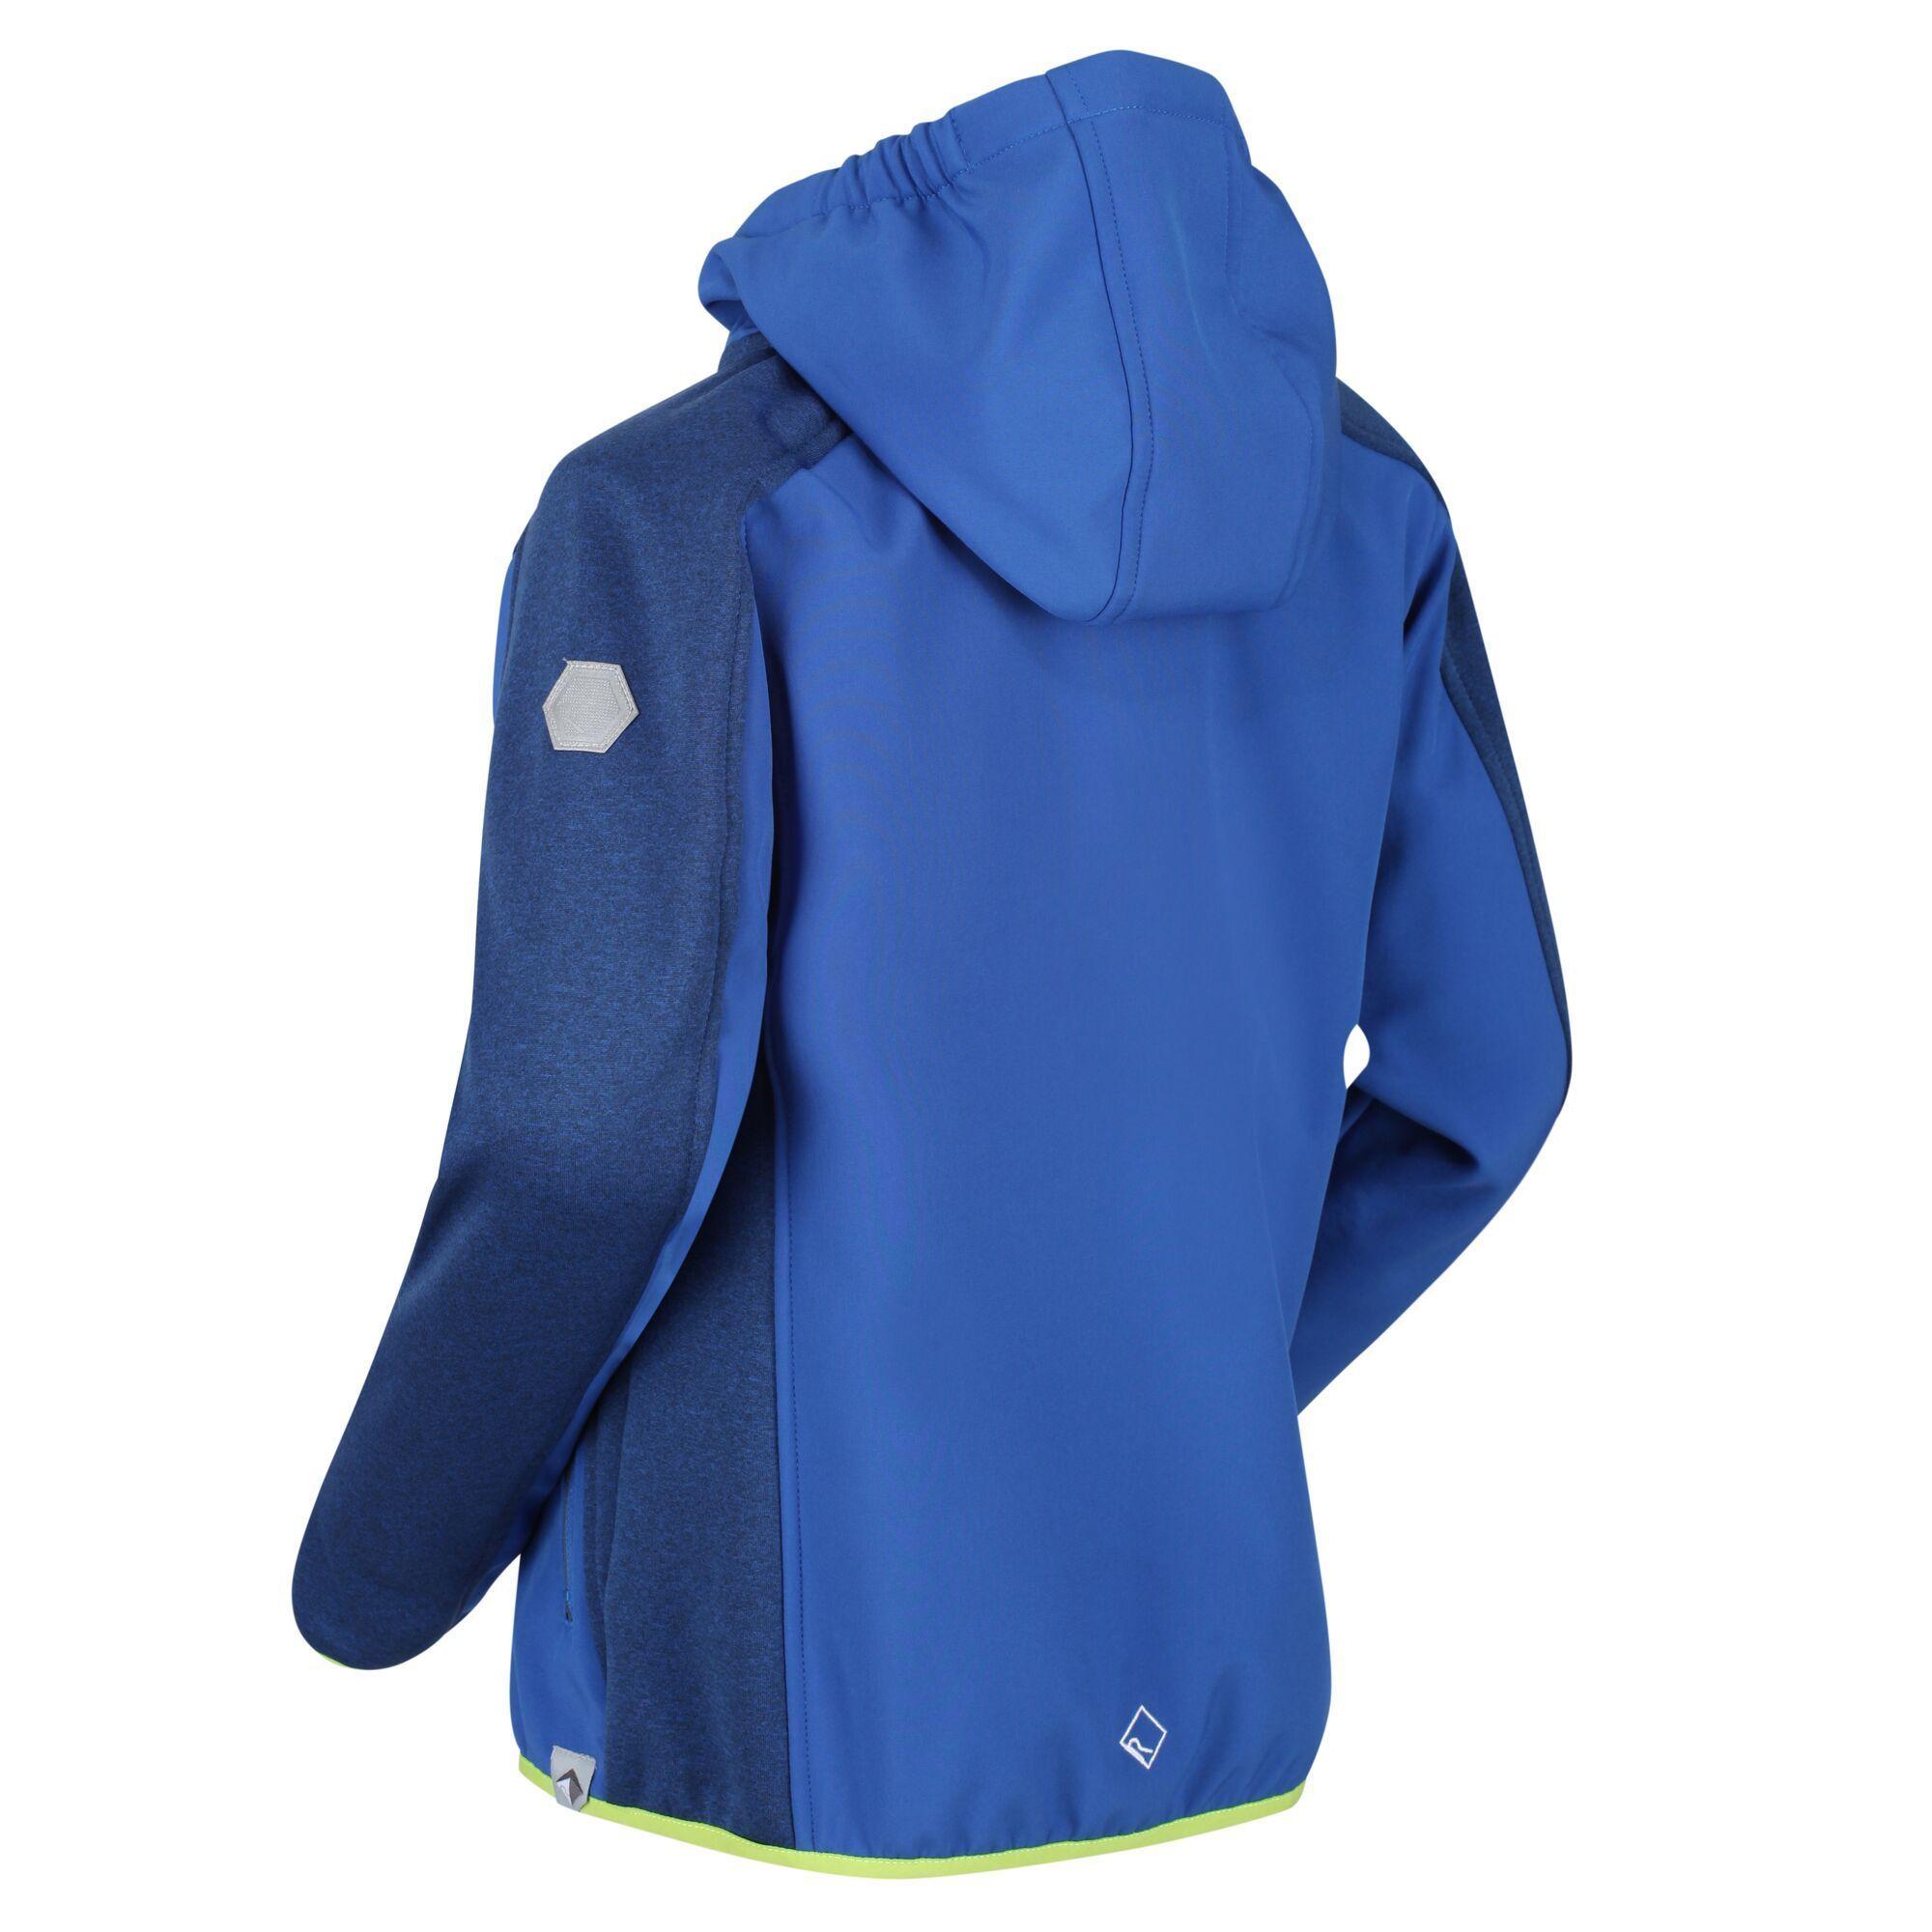 Regatta Childrens/Kids Bracknell II Softshell Jacket